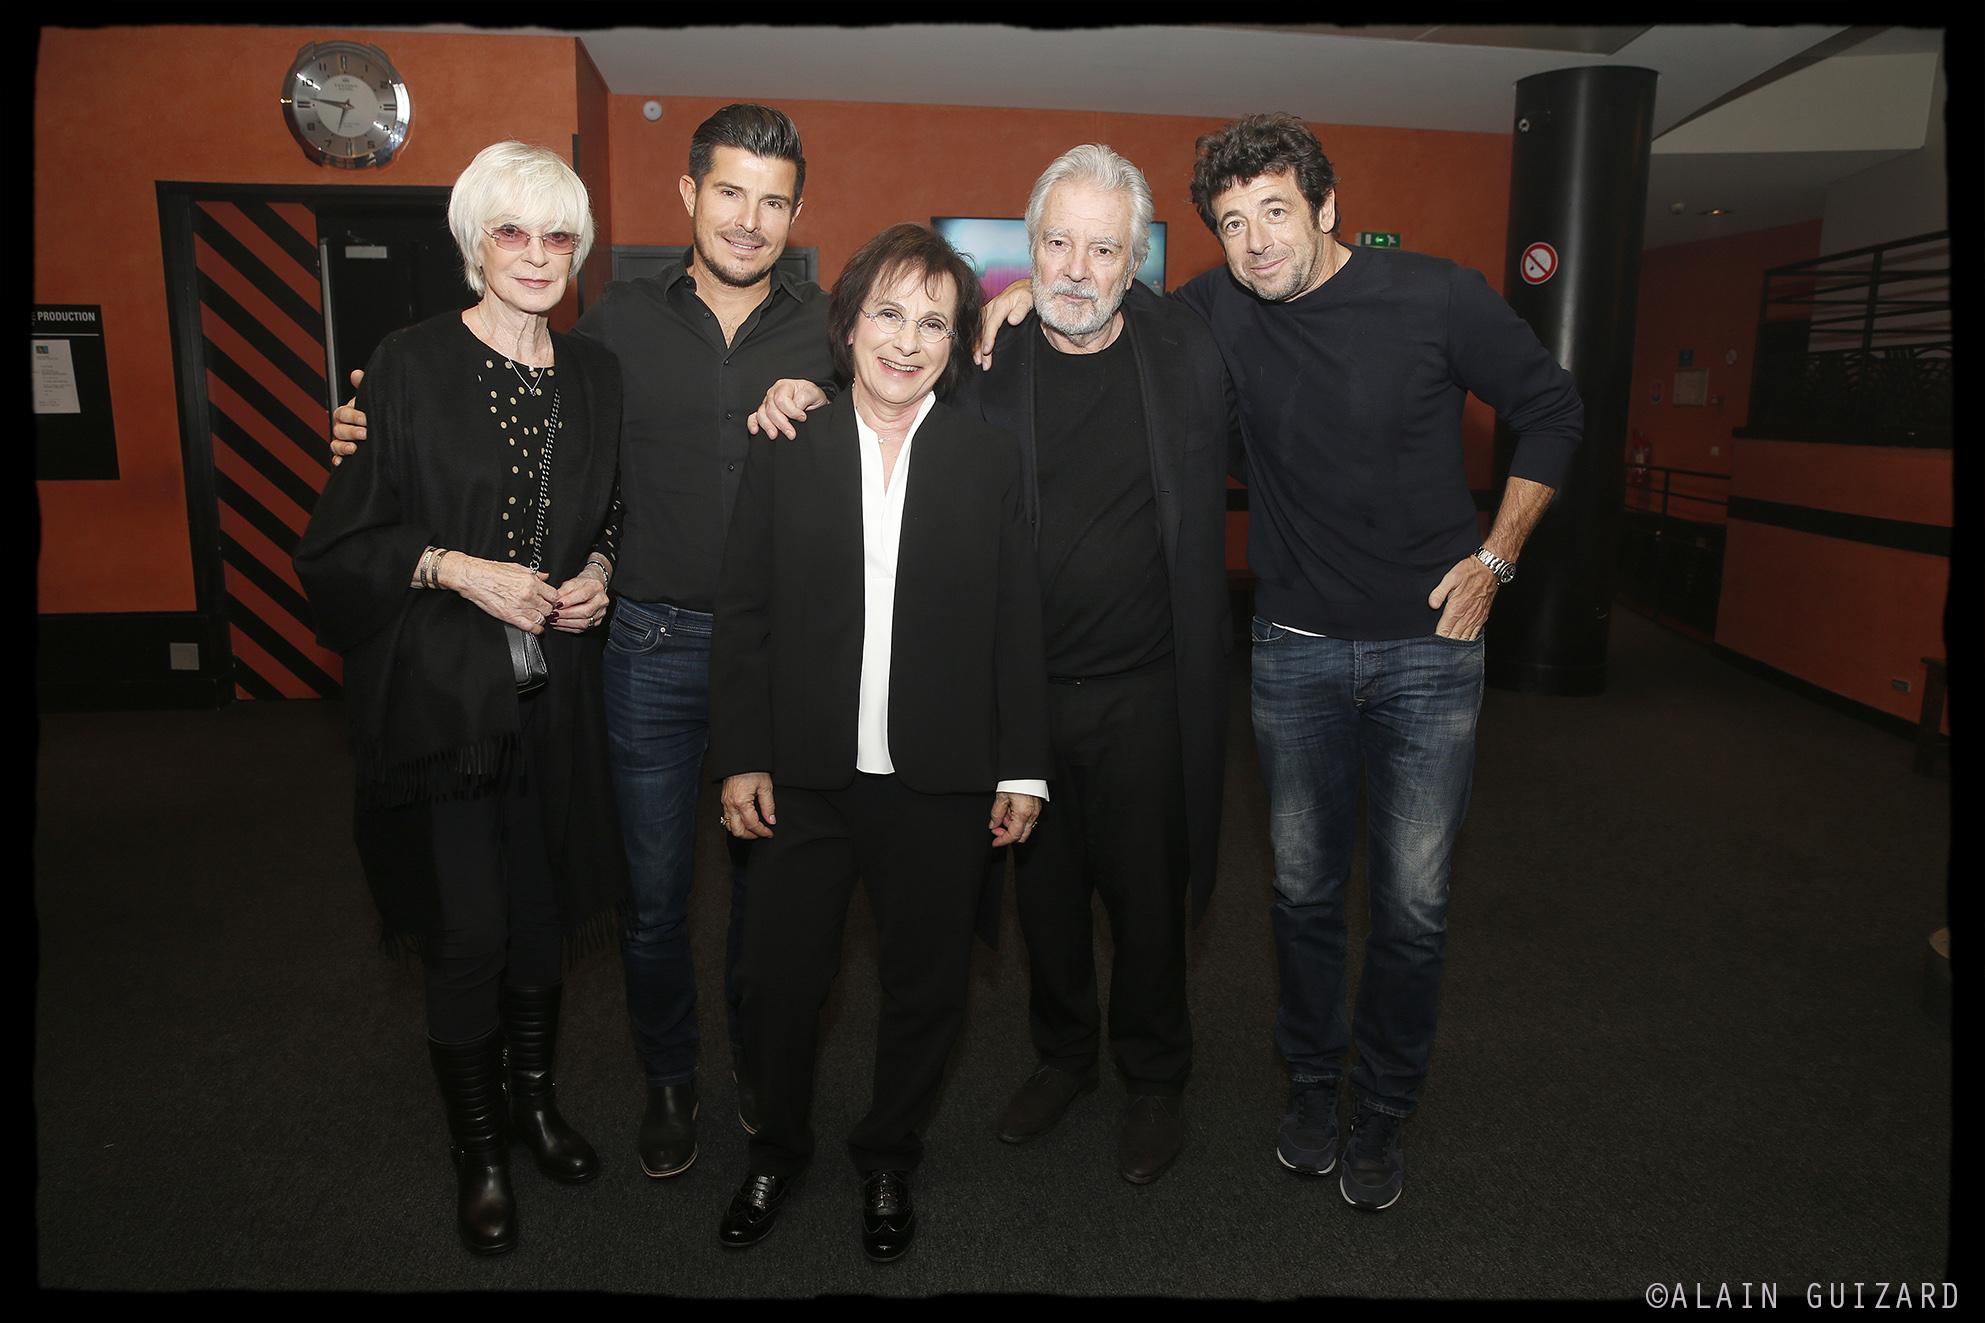 Alice Dona, Vincent Niclo, Marie Paule Belle, Pierre Arditi, Patrick Bruel